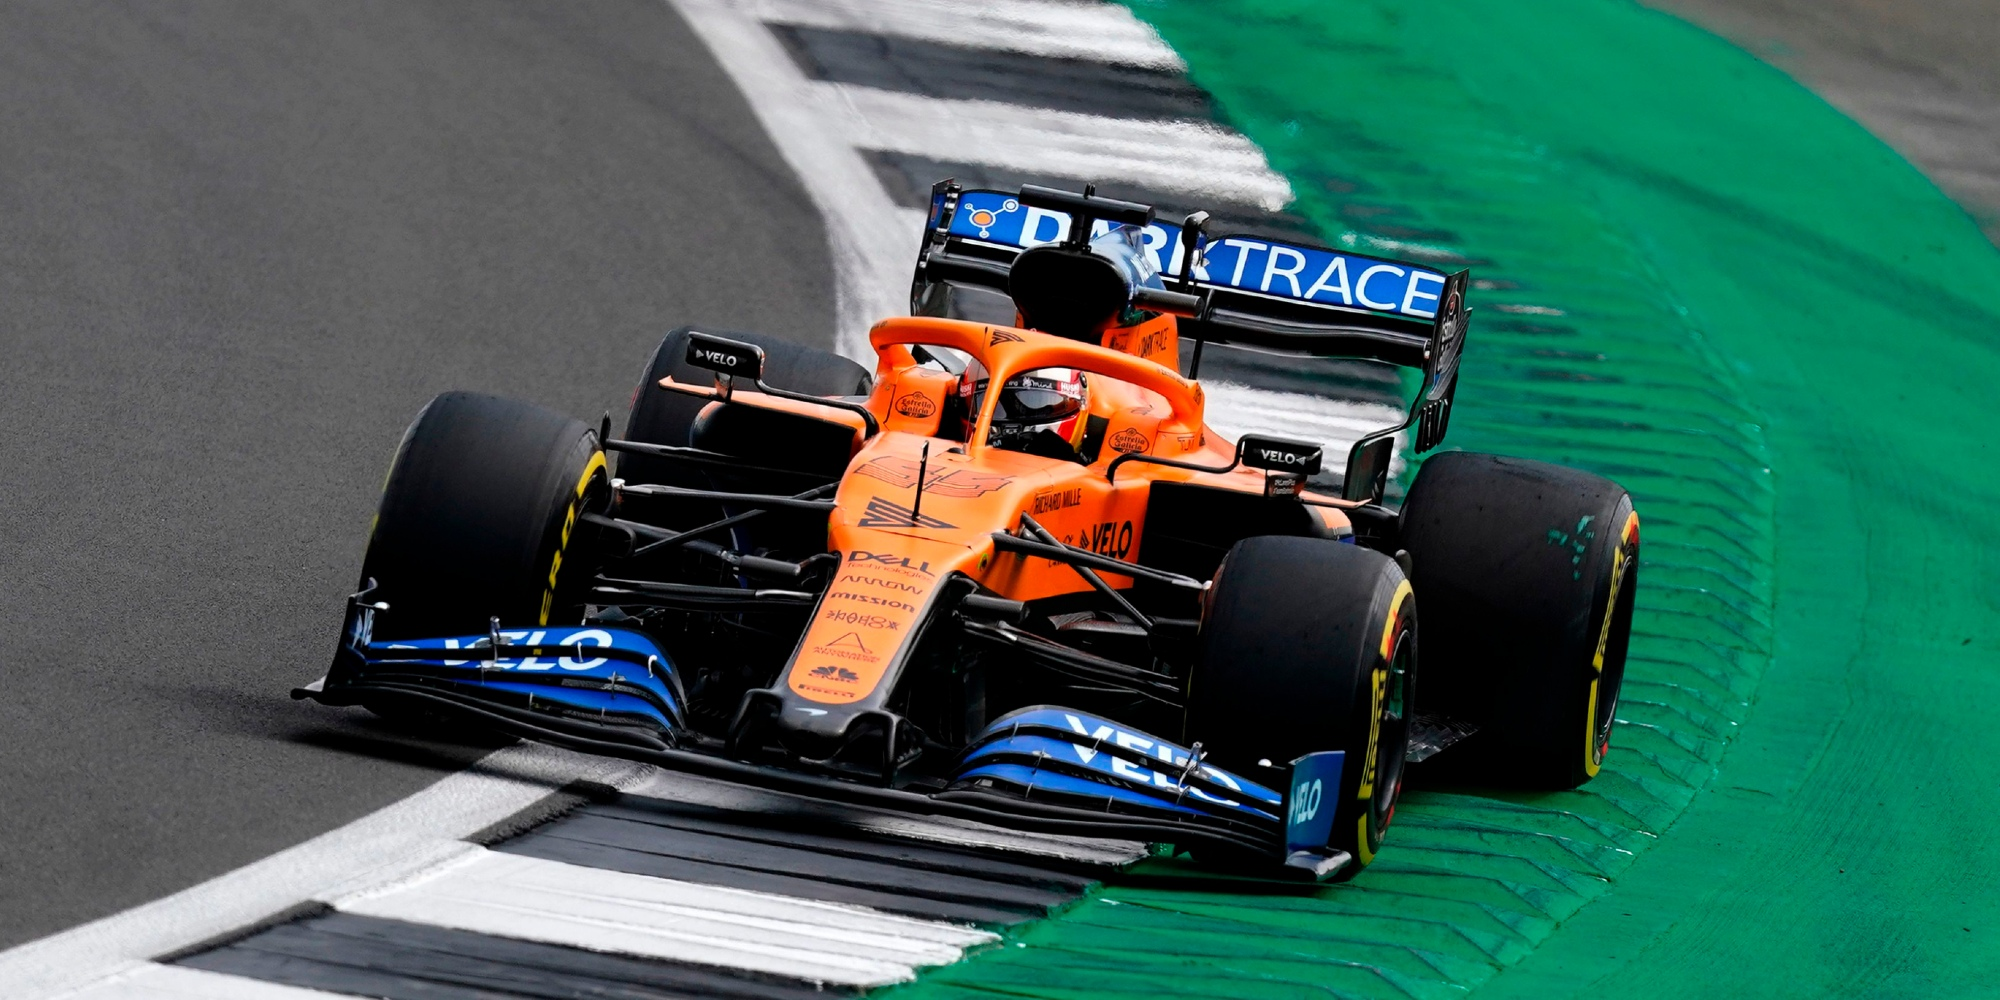 Carlos Sainz, 2020 70th Anniversary GP